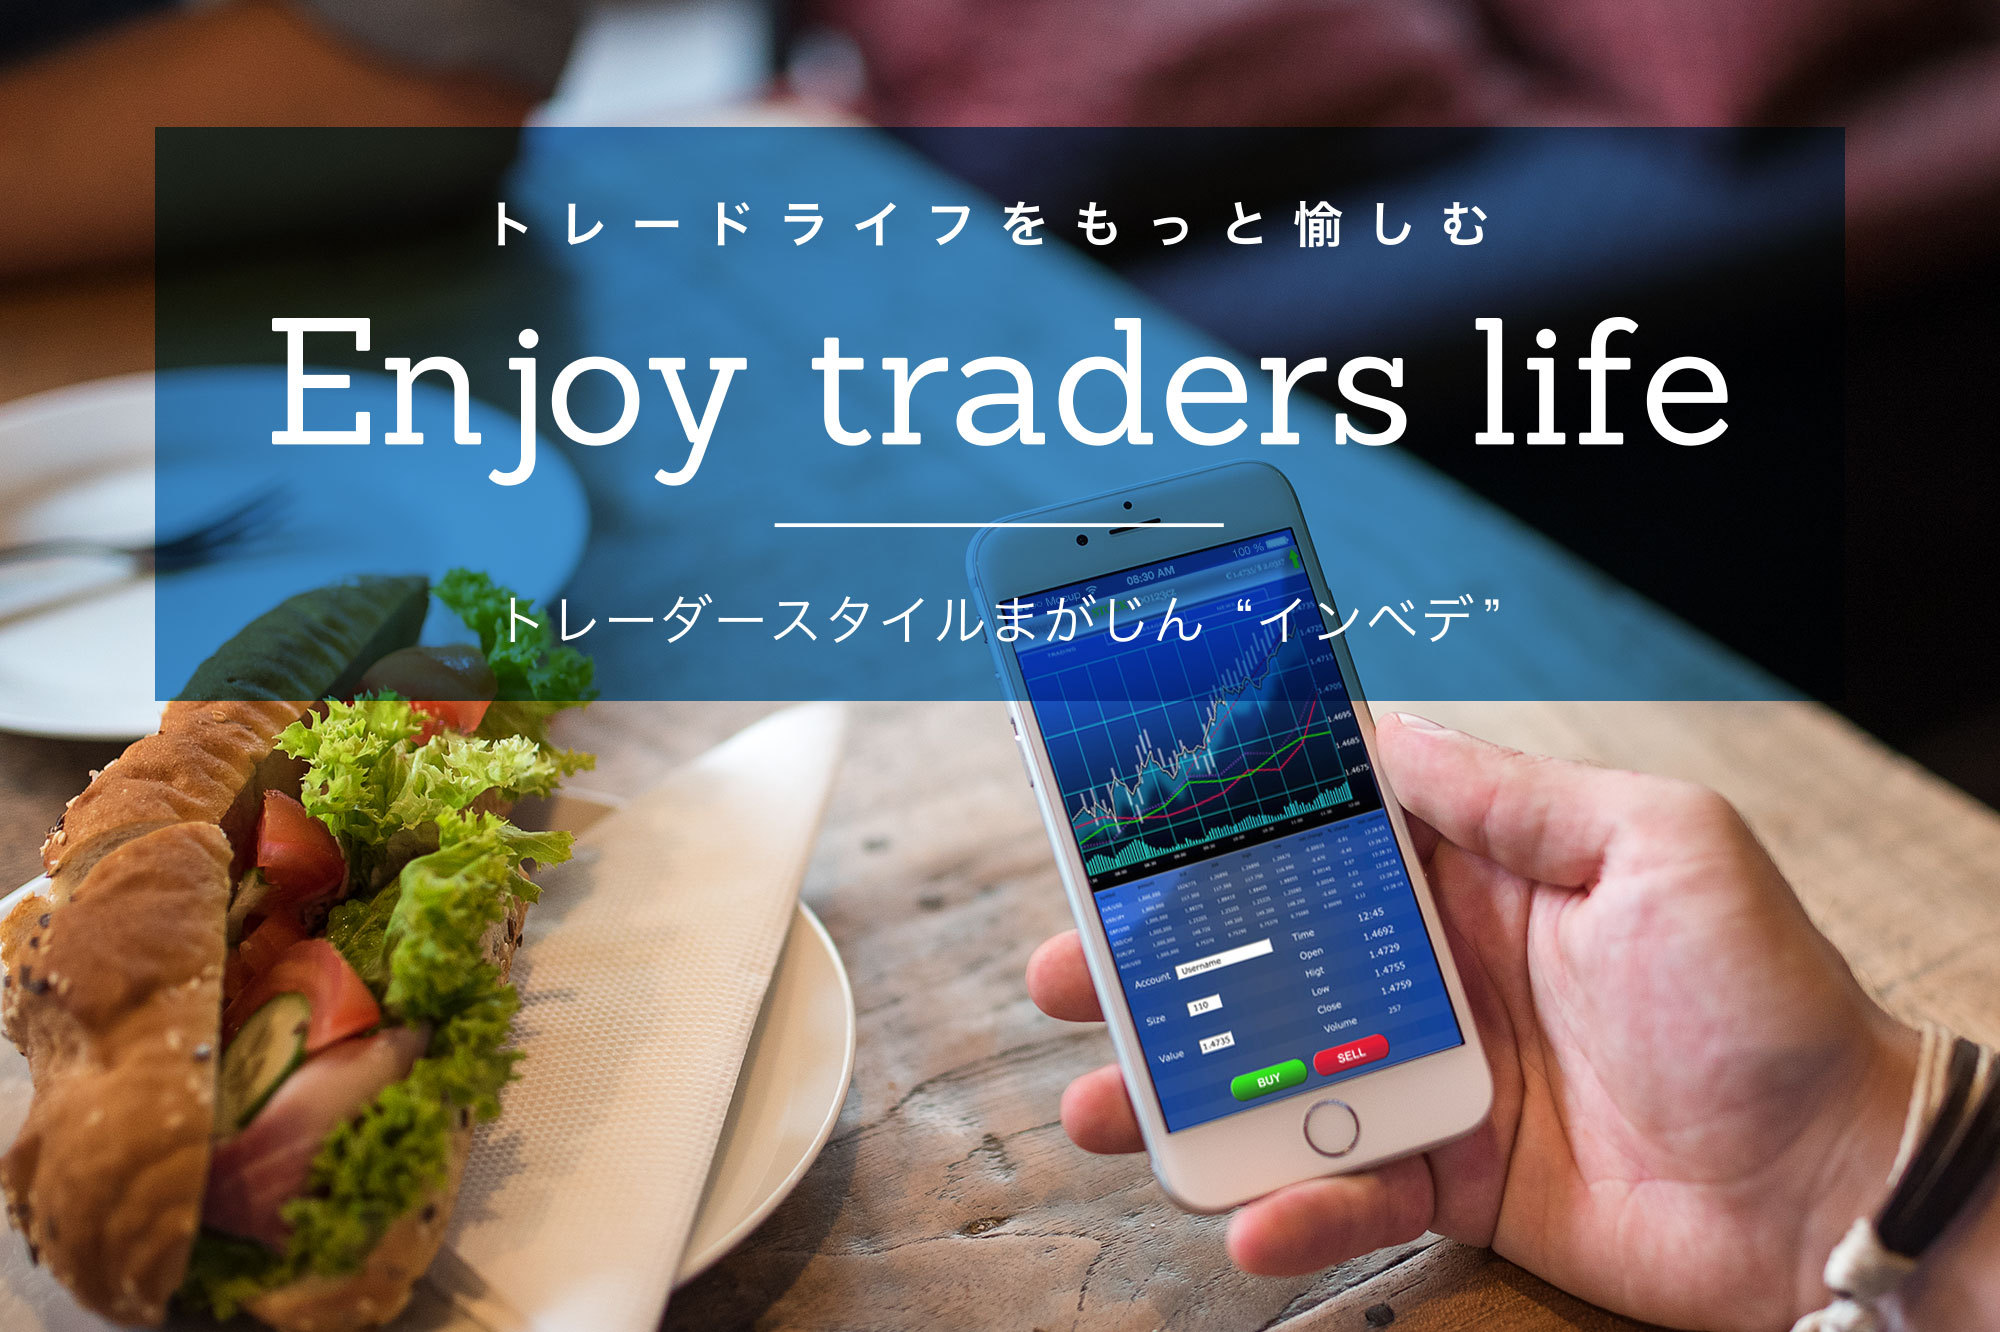 trader style magazine